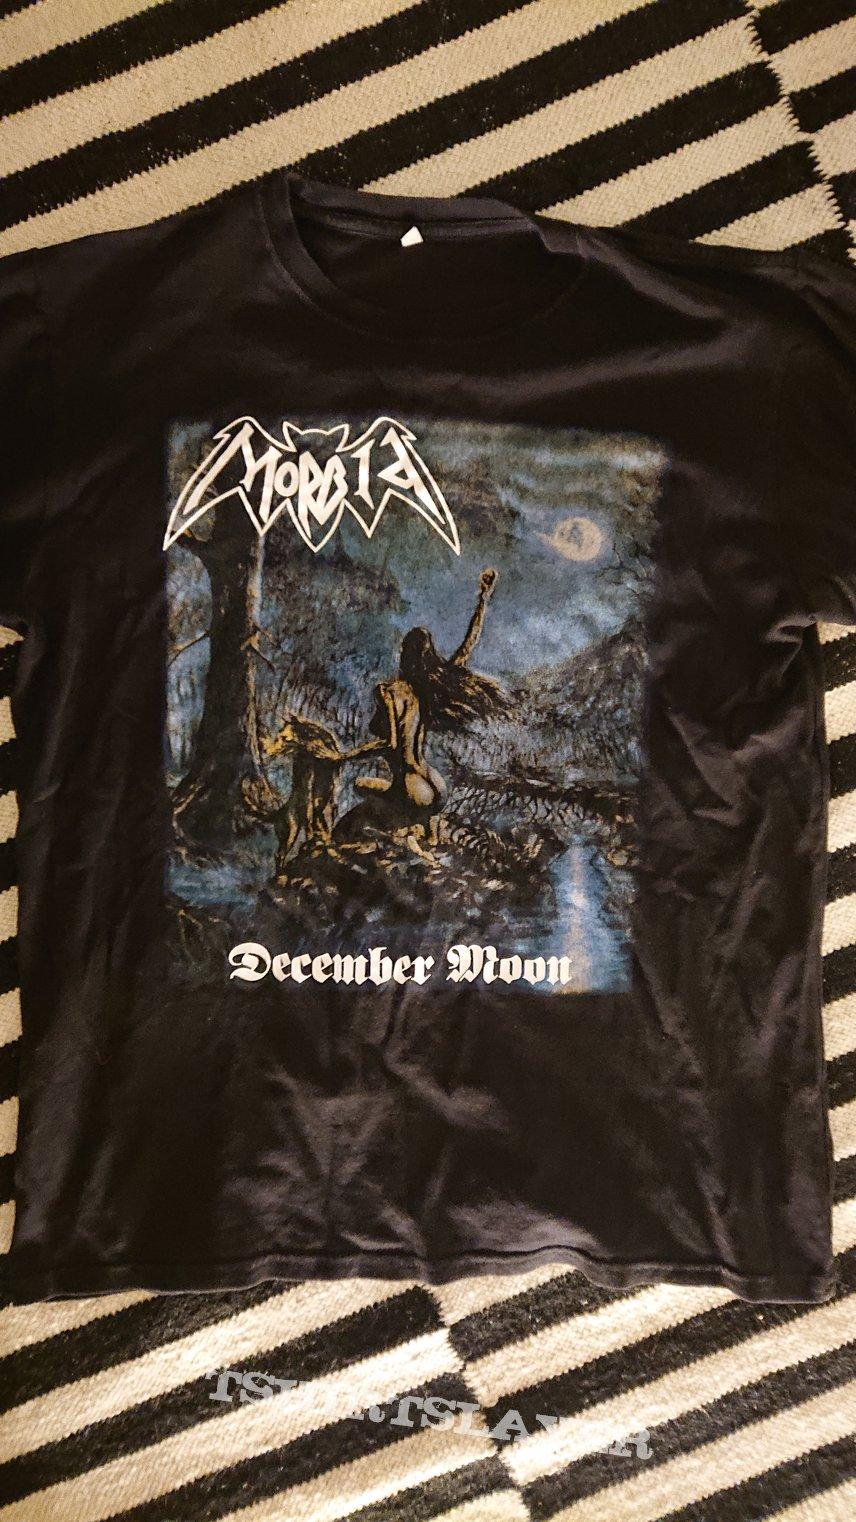 Morbid - December Moon T-shirt